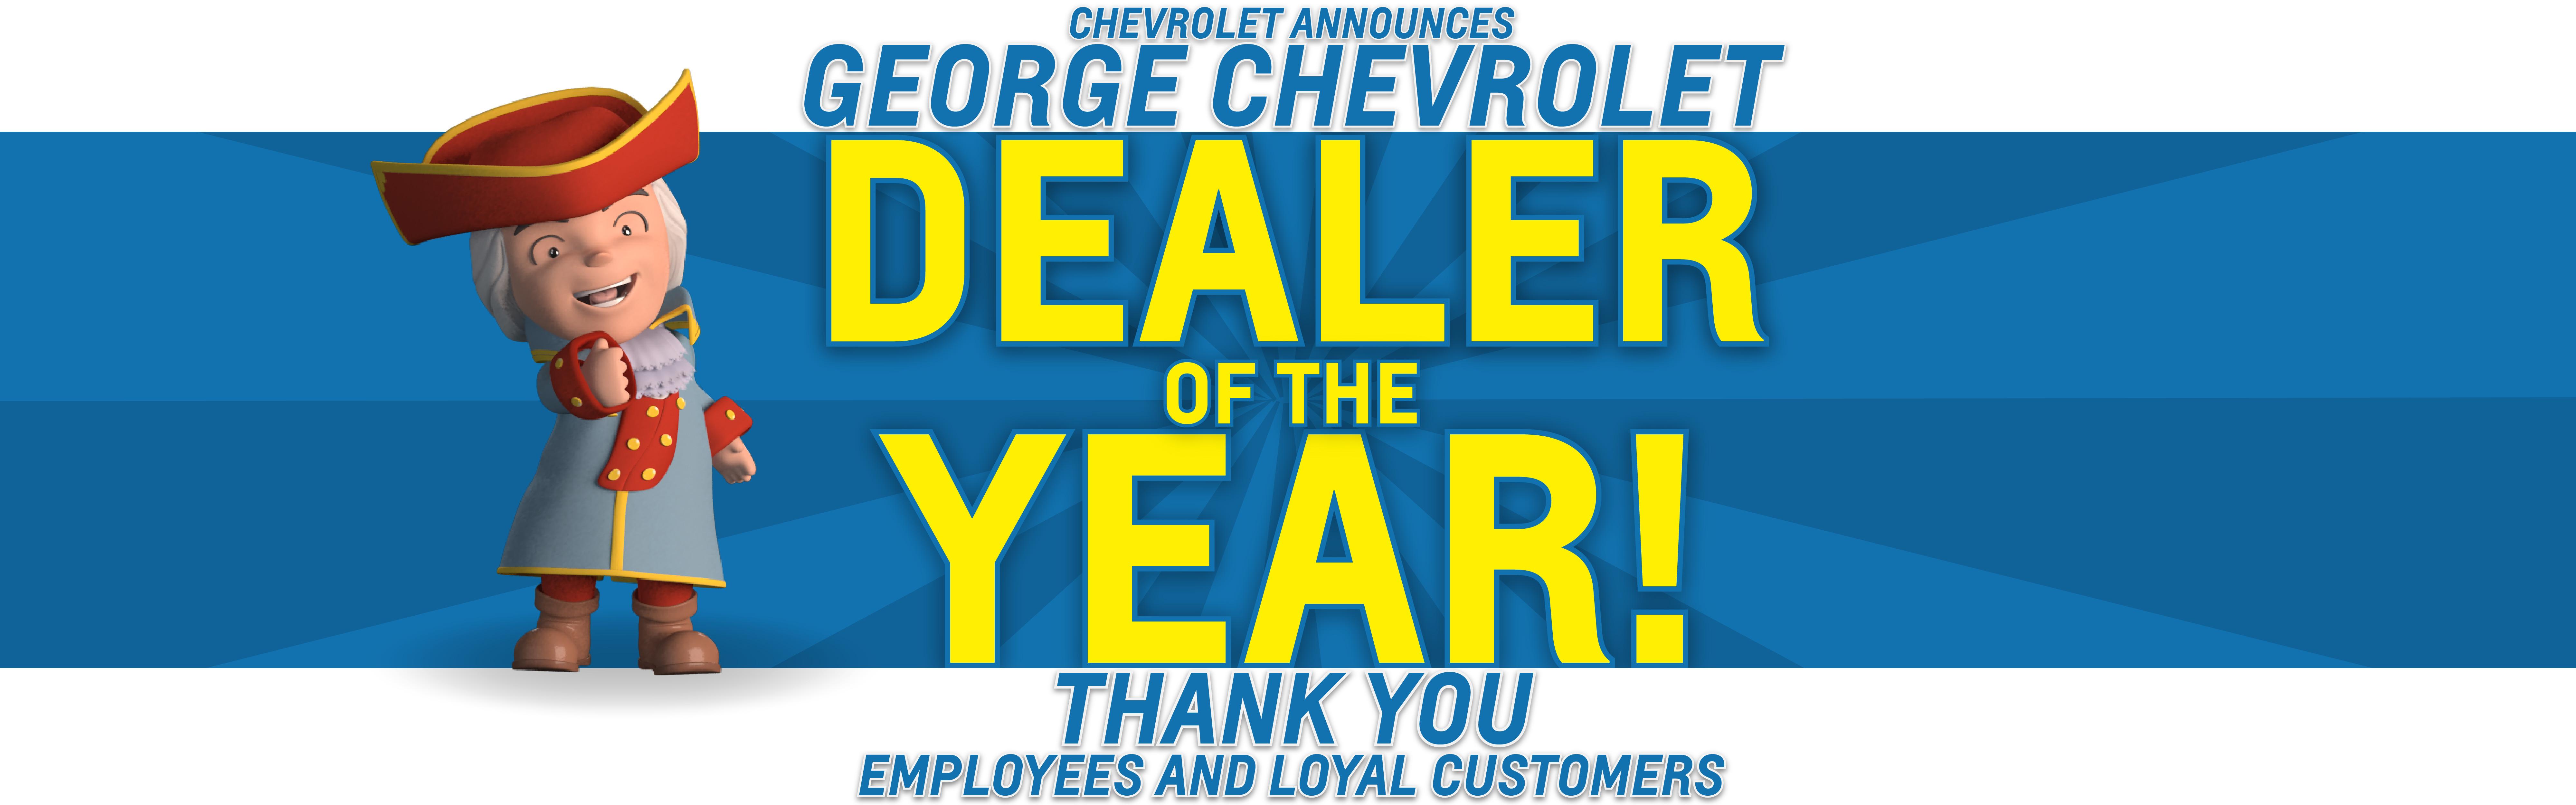 Chevrolet Dealer Serving Los Angeles Orange County Long Beach